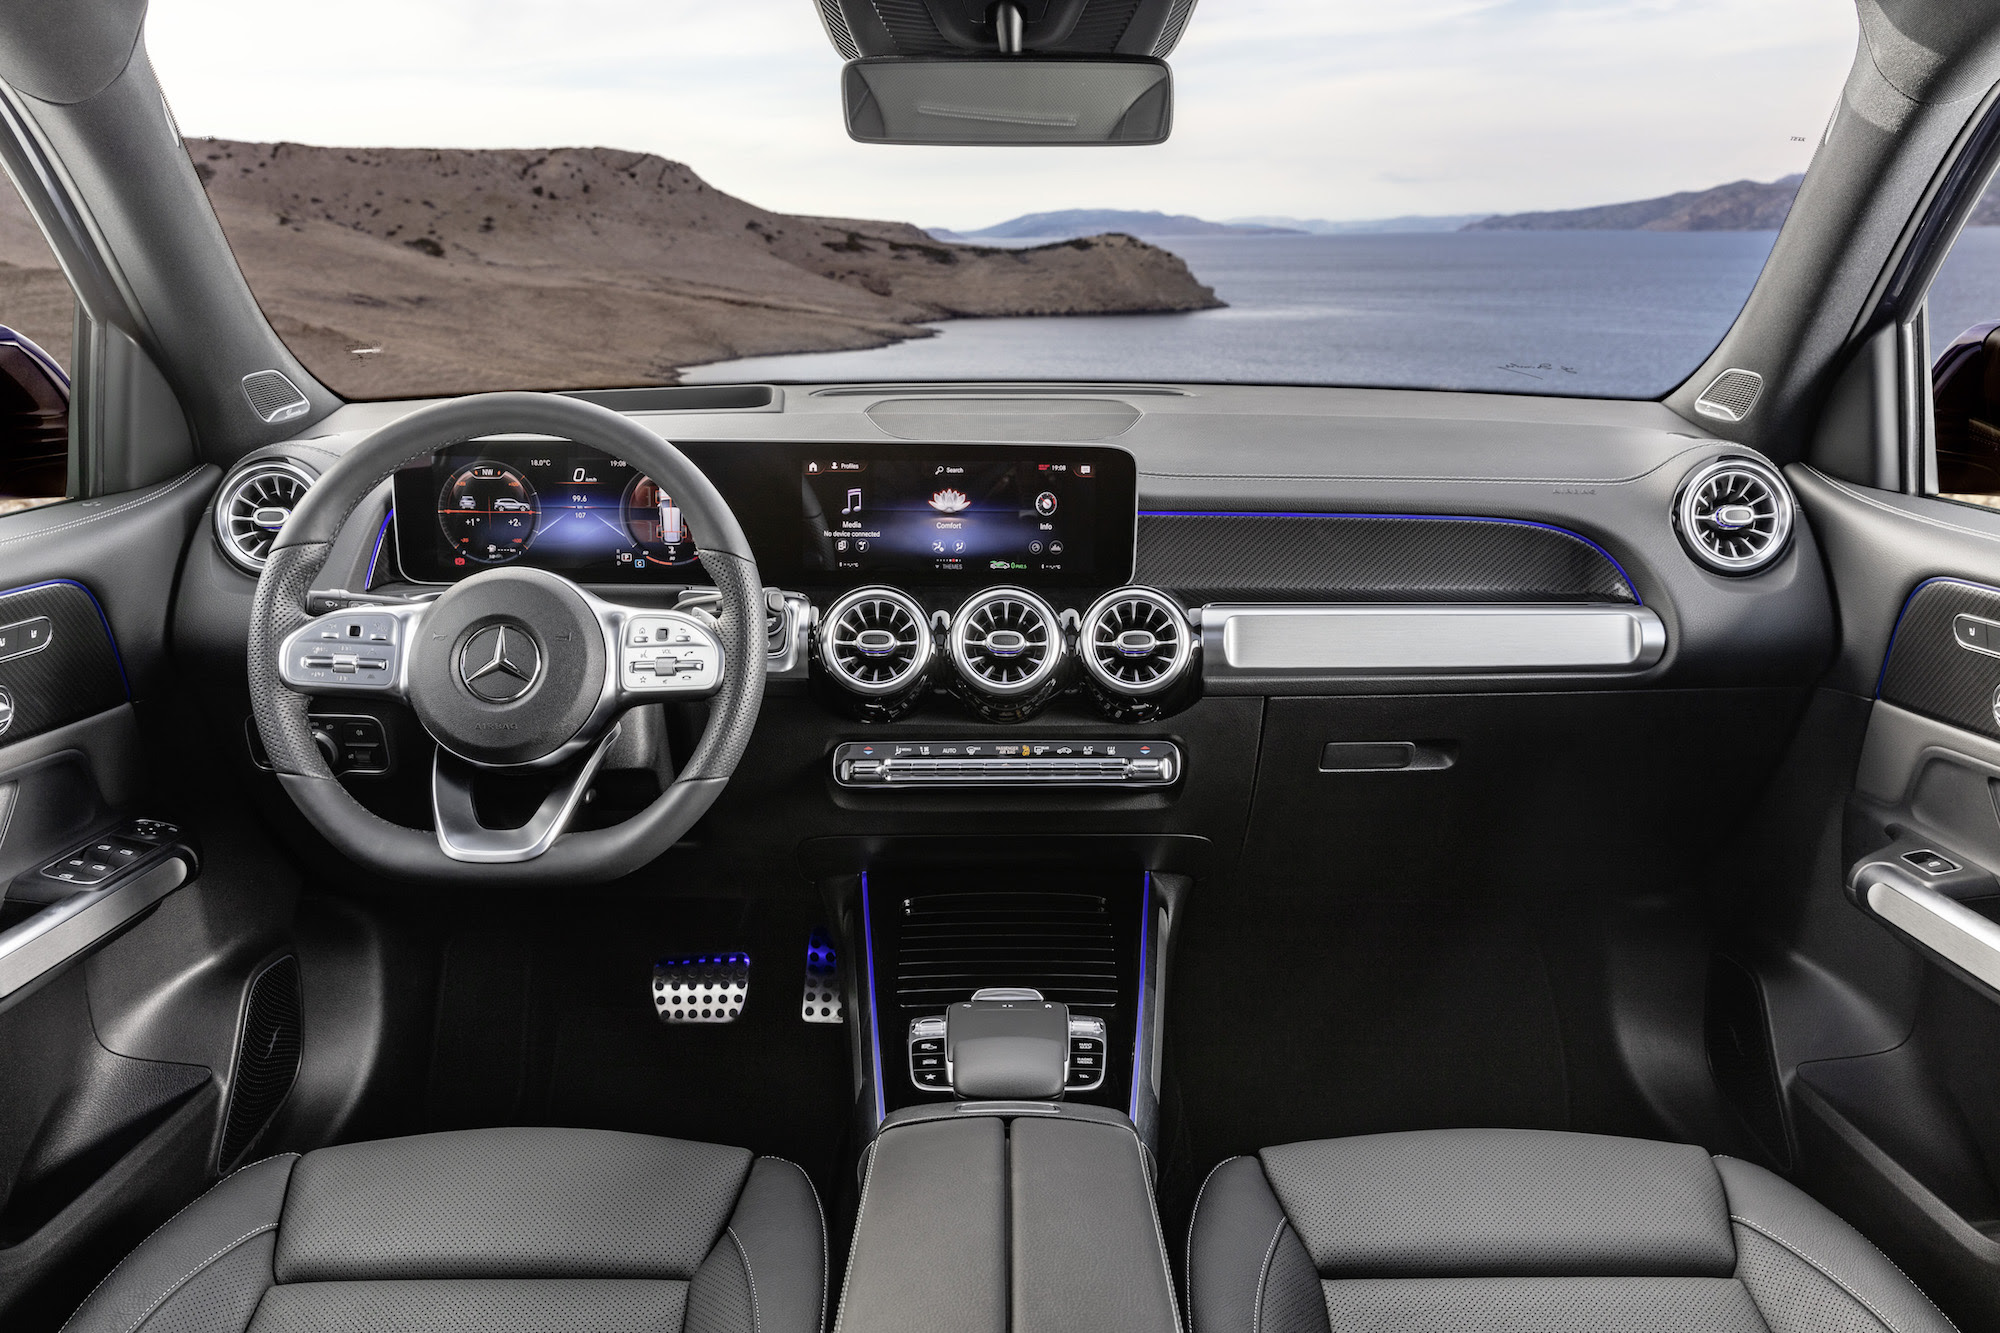 First Look: 2020 Mercedes-Benz GLB 250 4MATIC | CAR